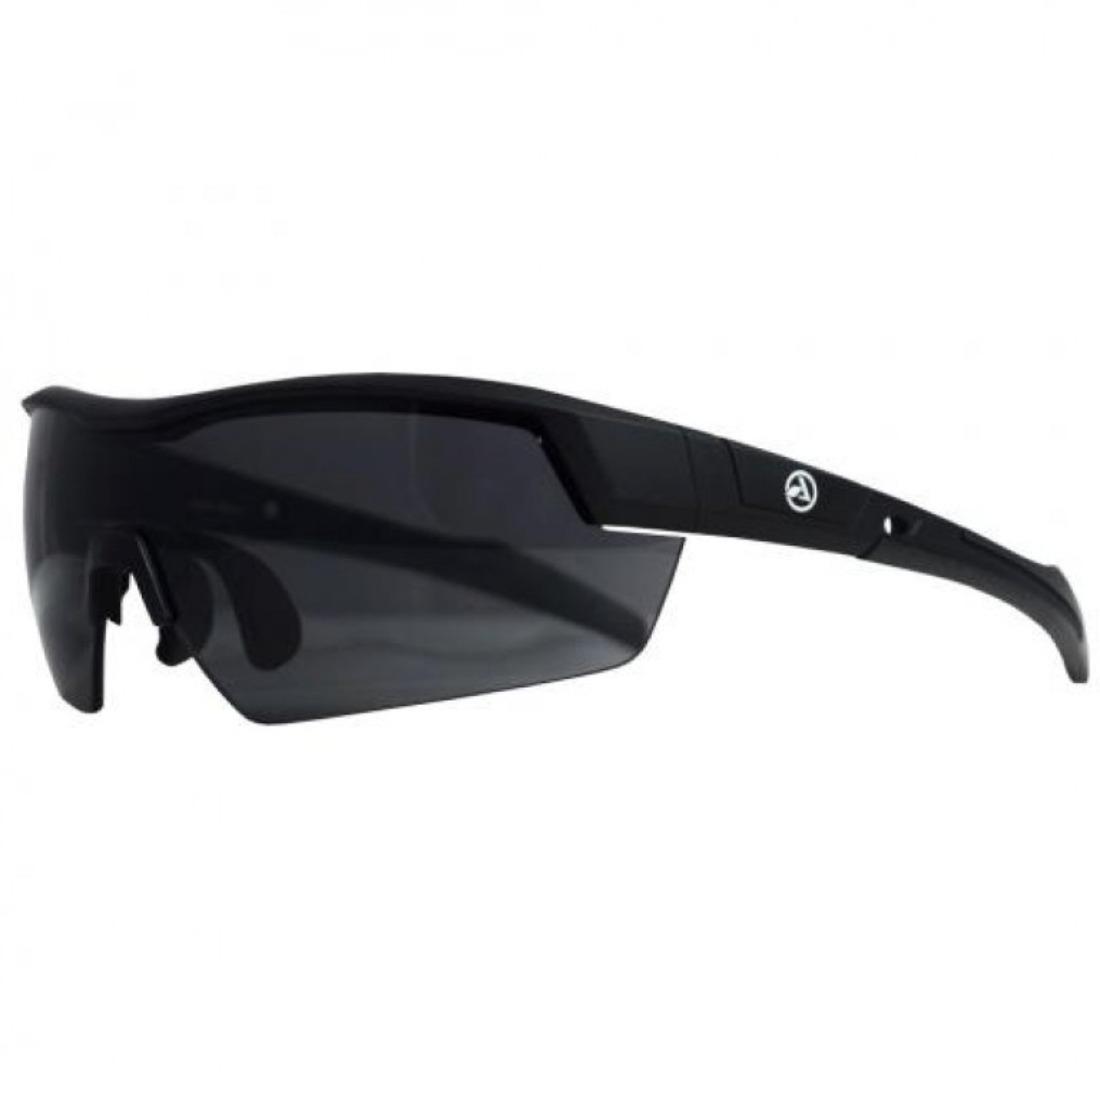 Óculos Mtb Ciclismo Absolute Race Rx Anti Uv 400 P...